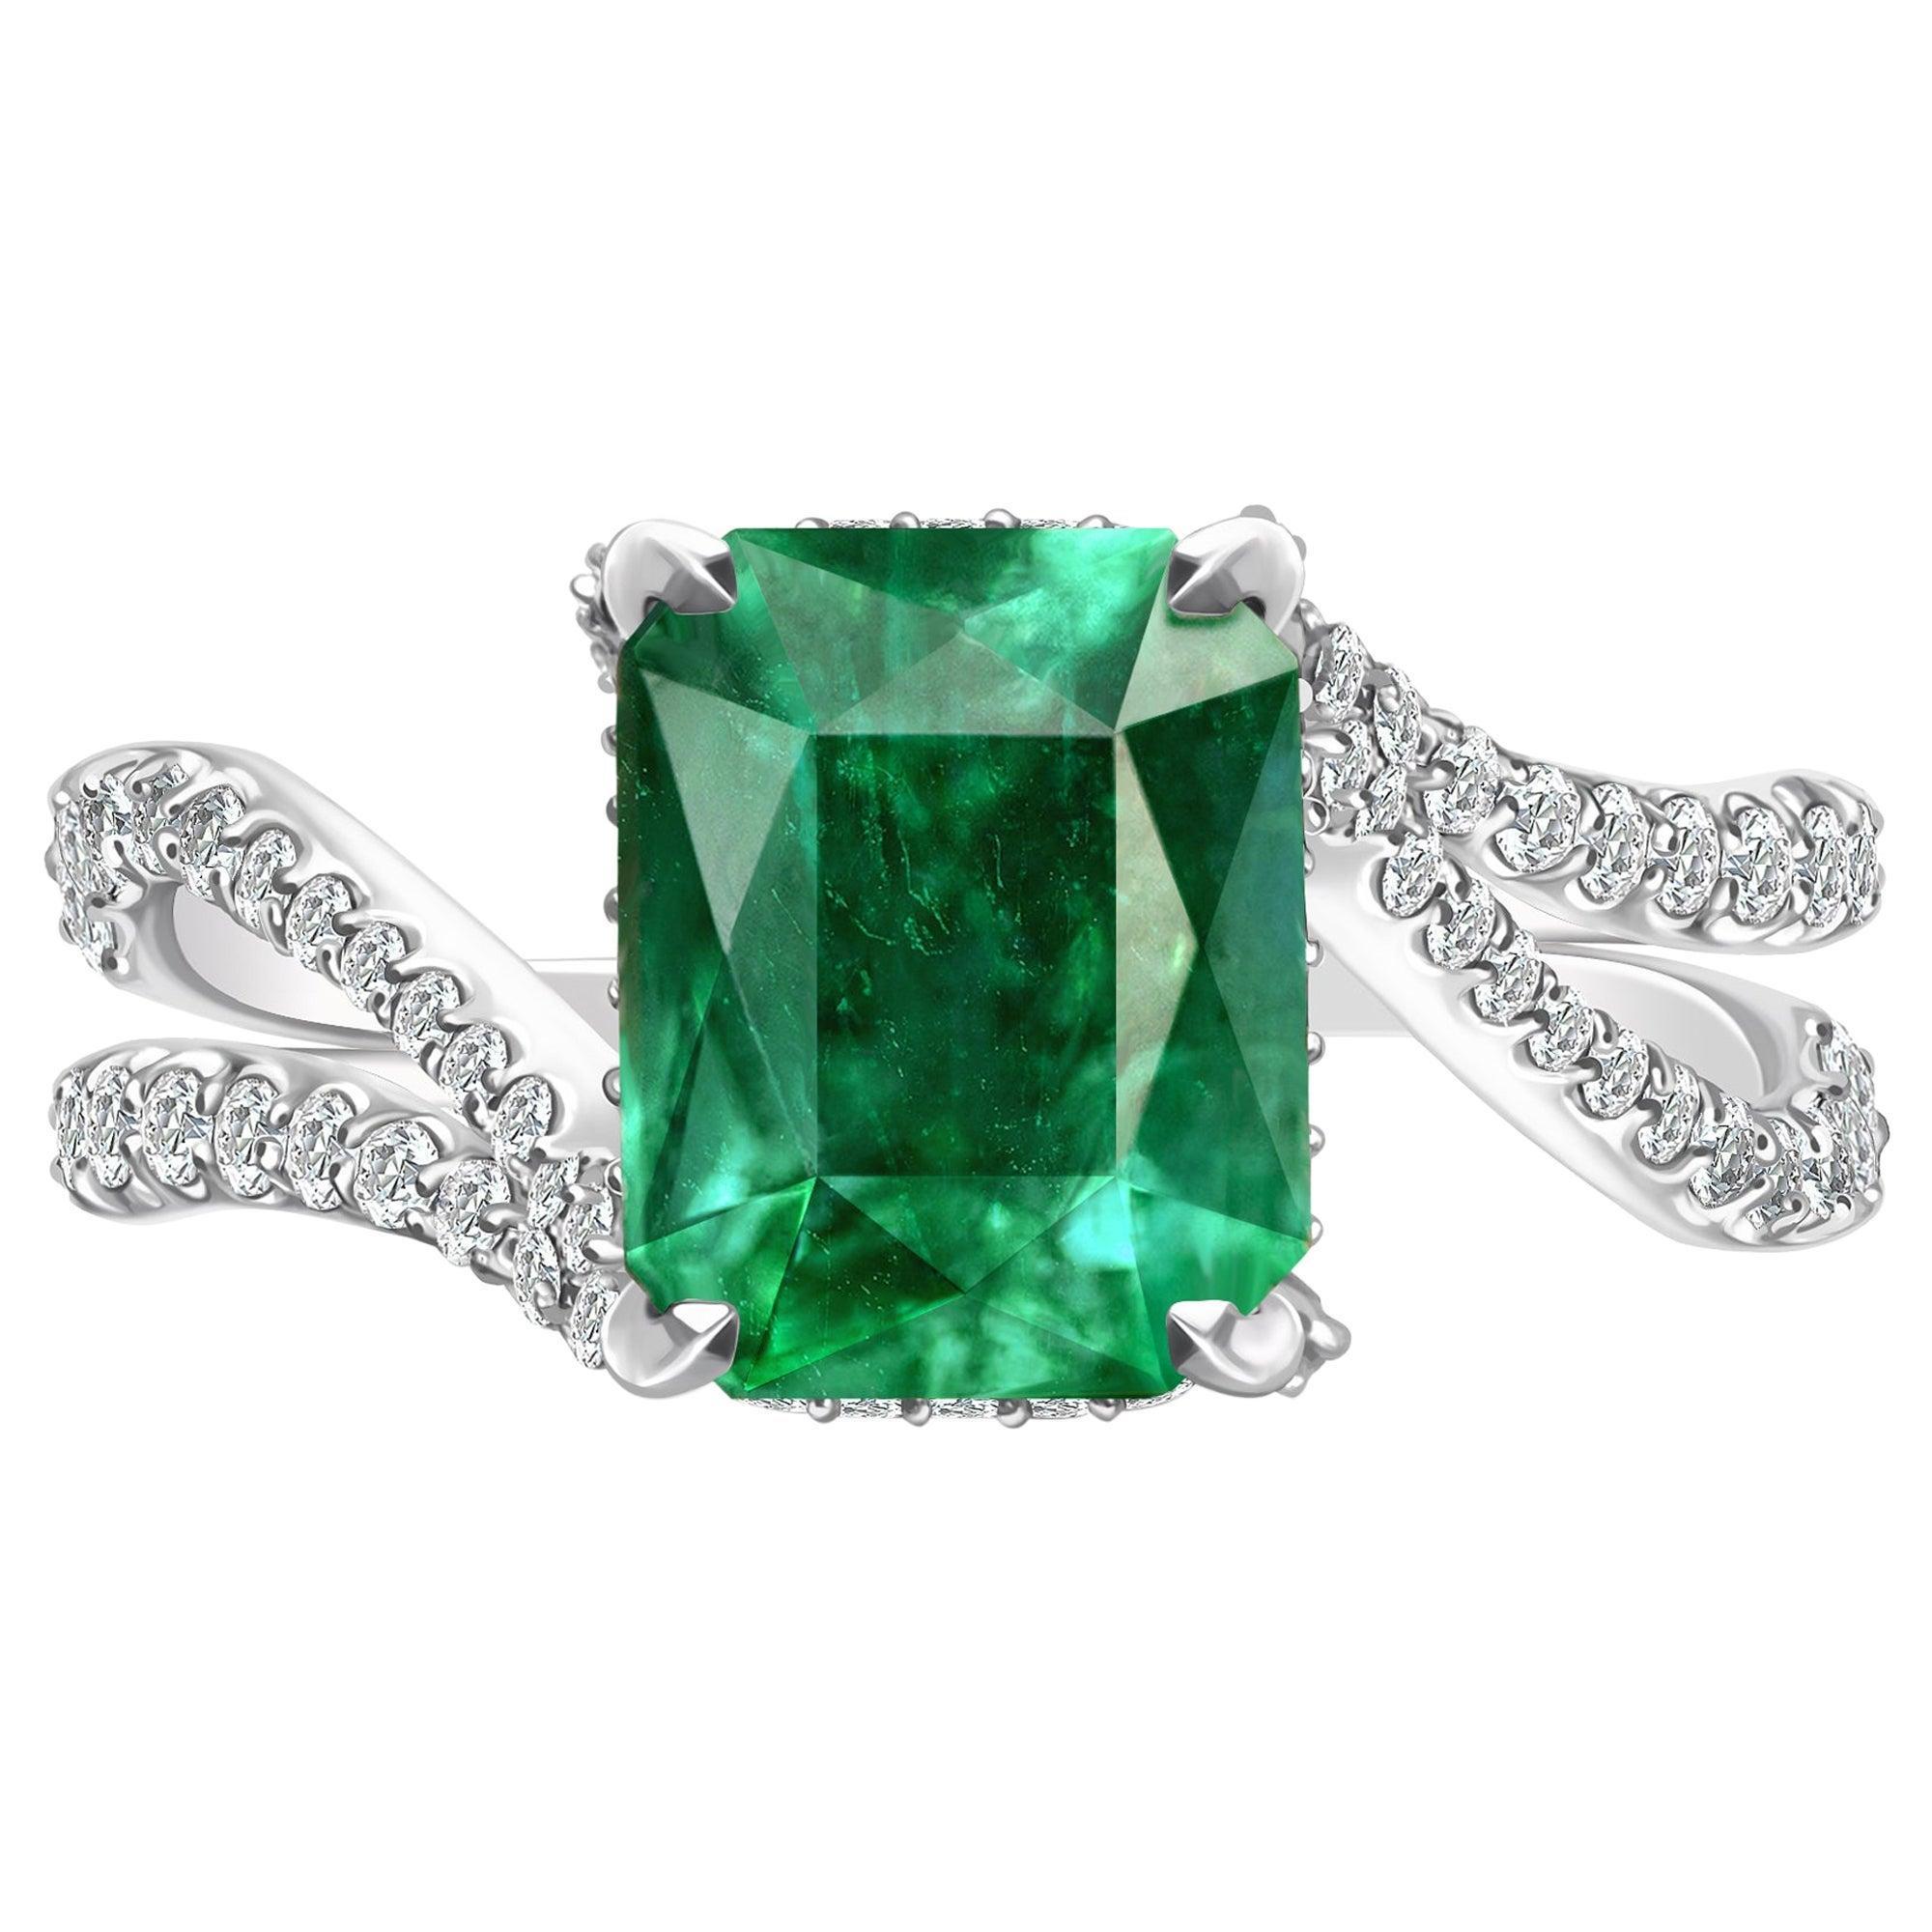 3 Carat Zambian Emerald Diamond 18 Karat White Gold Ring